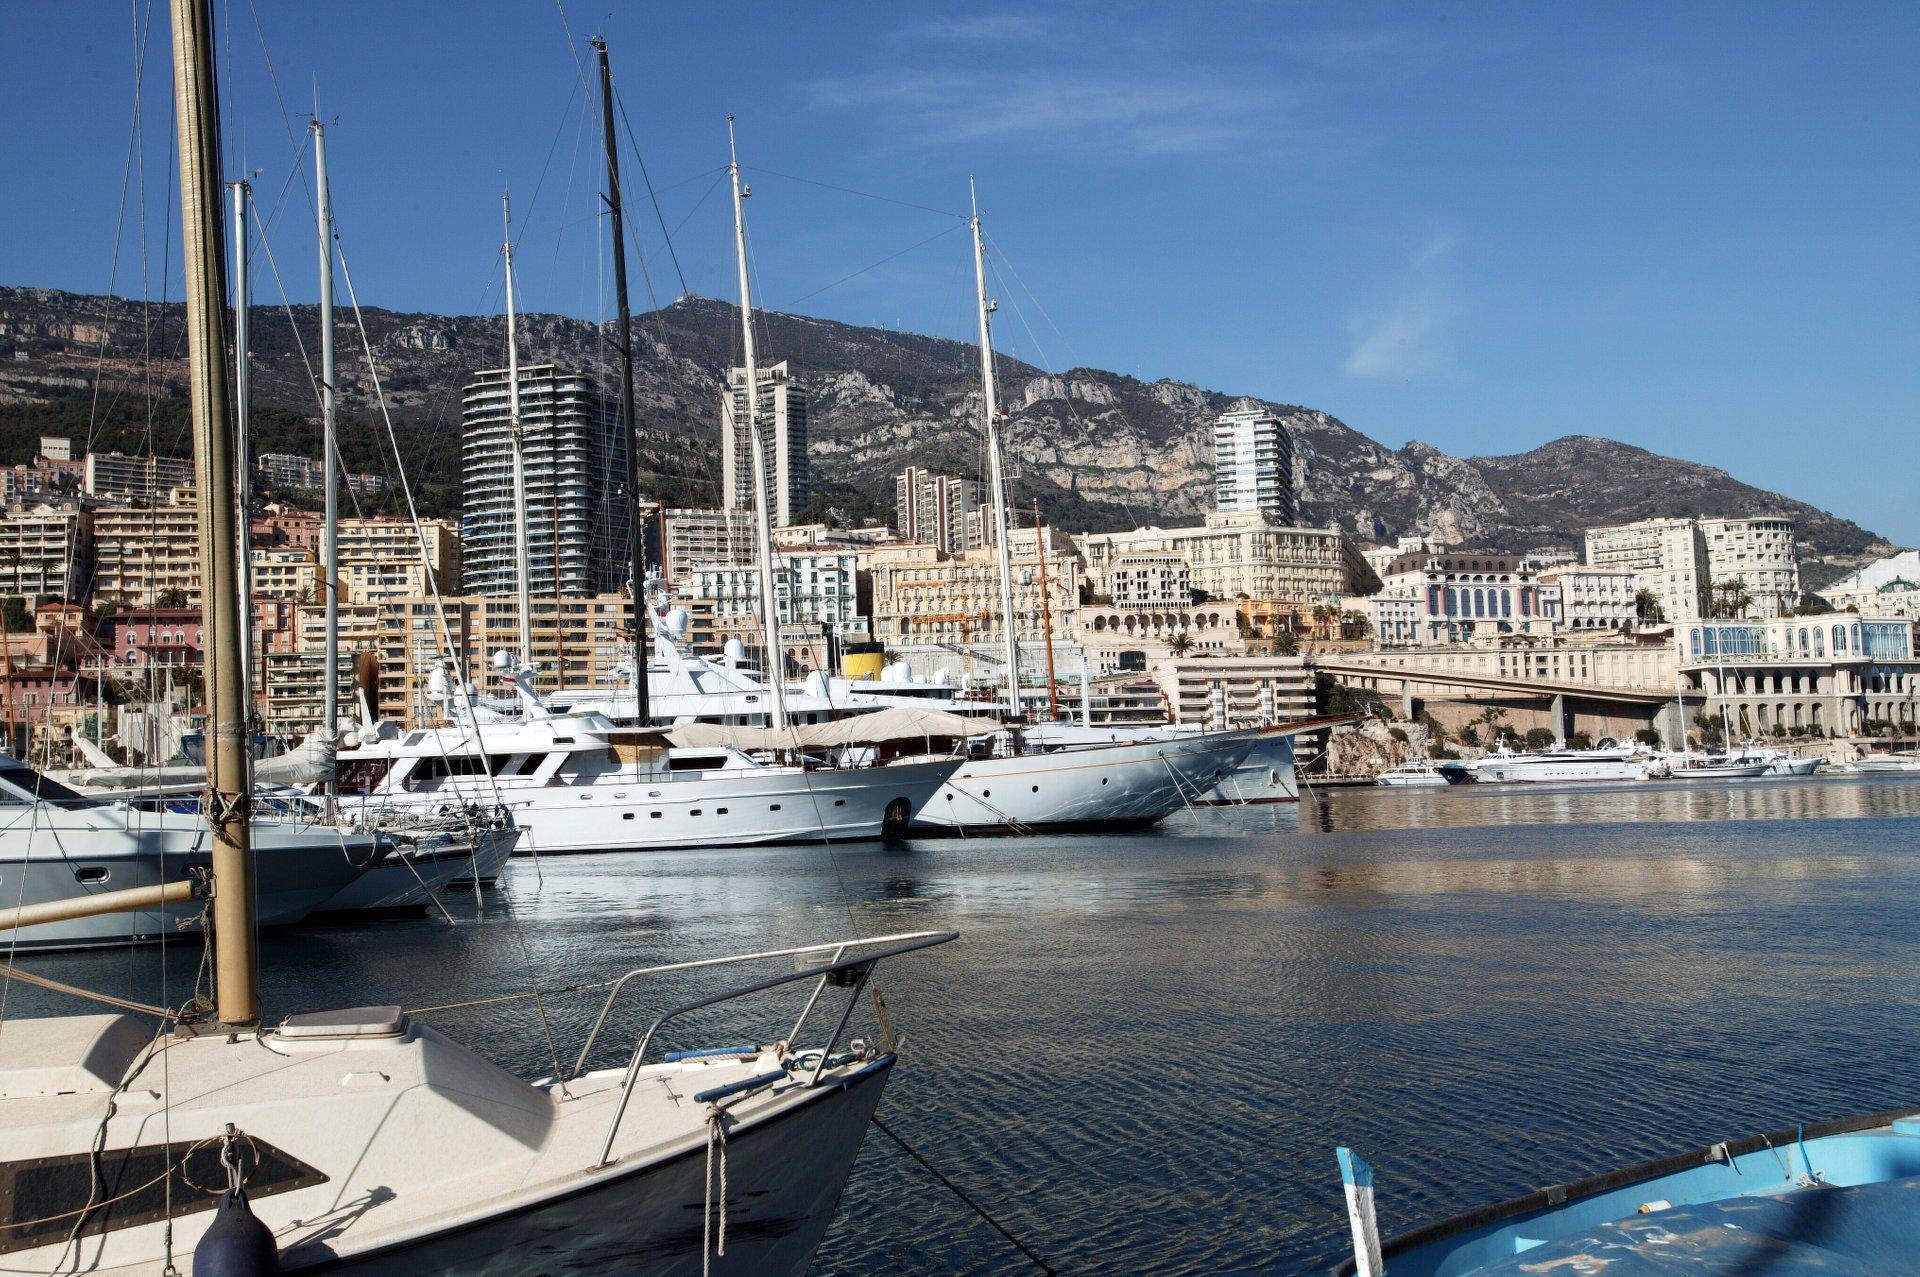 Sailing Season in Monaco - Best Time